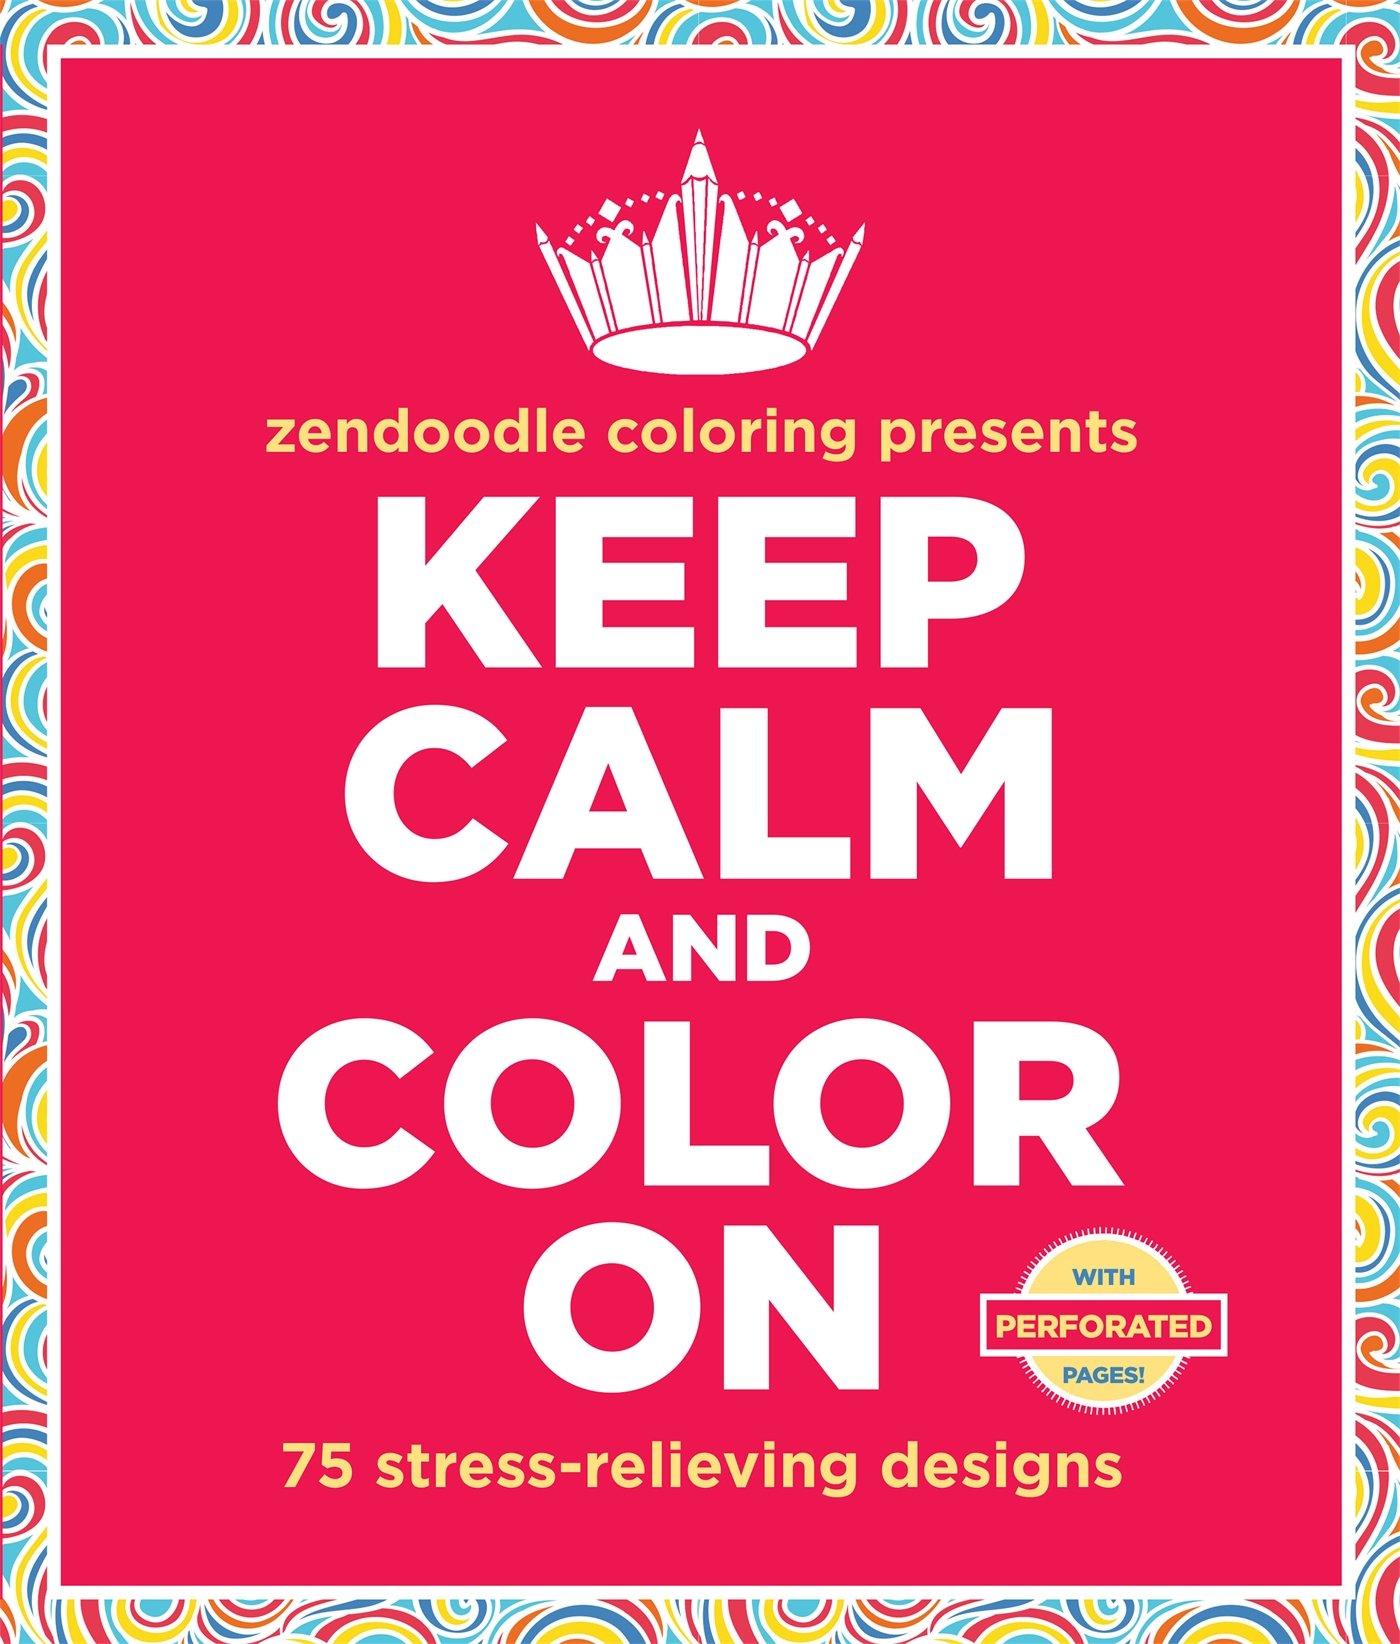 Zen doodle colour - Amazon Com Zendoodle Coloring Presents Keep Calm And Color On 75 Stress Relieving Designs 9781250093332 Meredith Mennitt Books